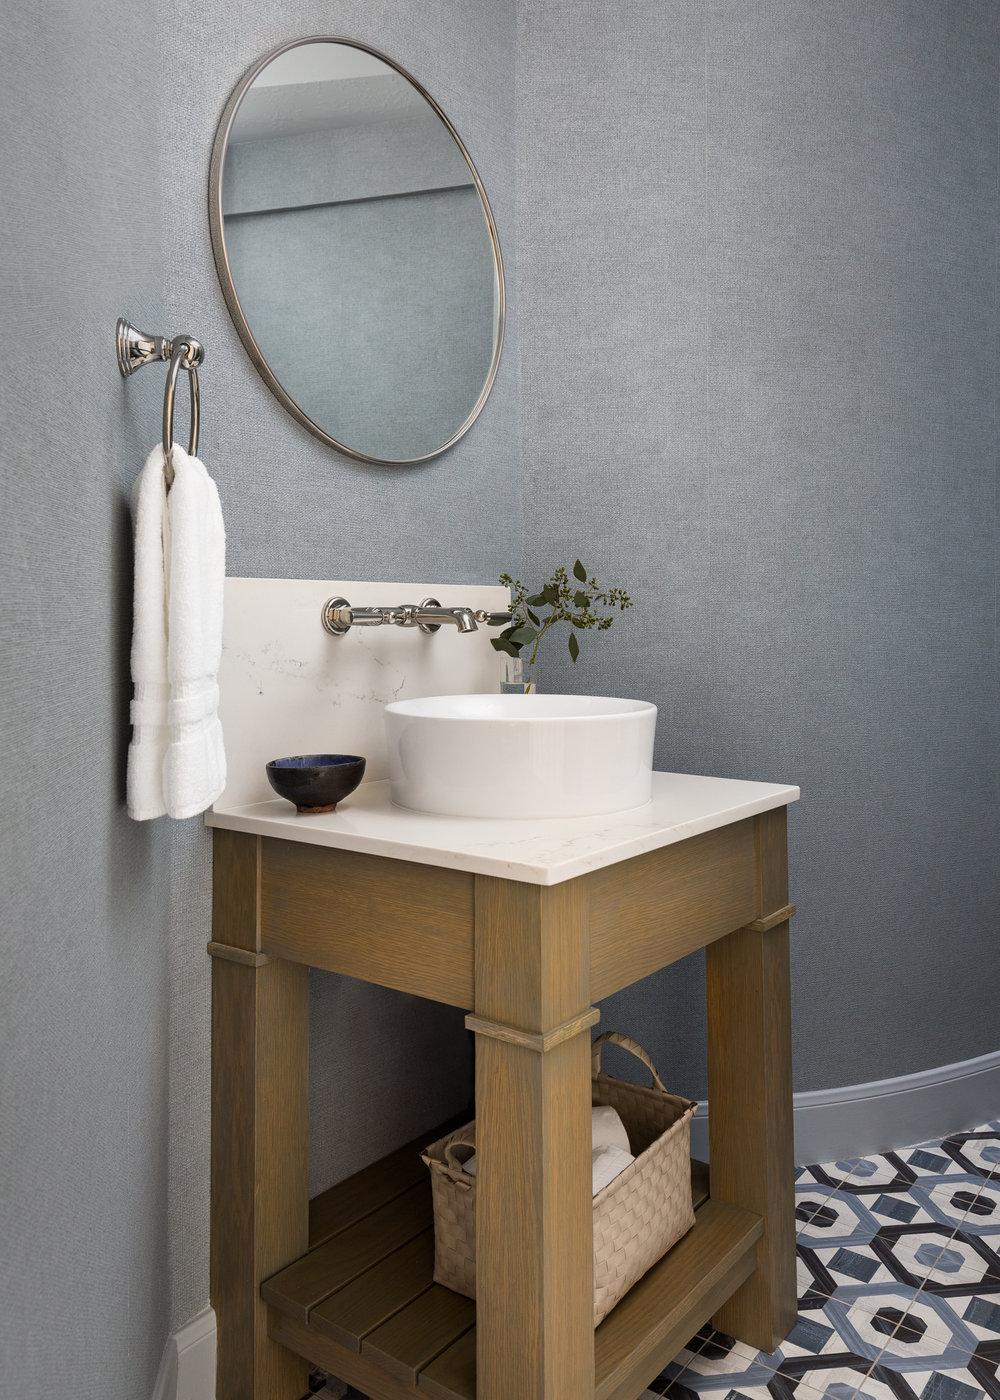 POWDER BATH ROUND UP |blue powder bath with porcelain concrete look tile floor, quartz countertop, chunky vessel sink, wall mount faucet | Designer: Carla Aston, Photographer: Colleen Scott | #powderbath #powderroom